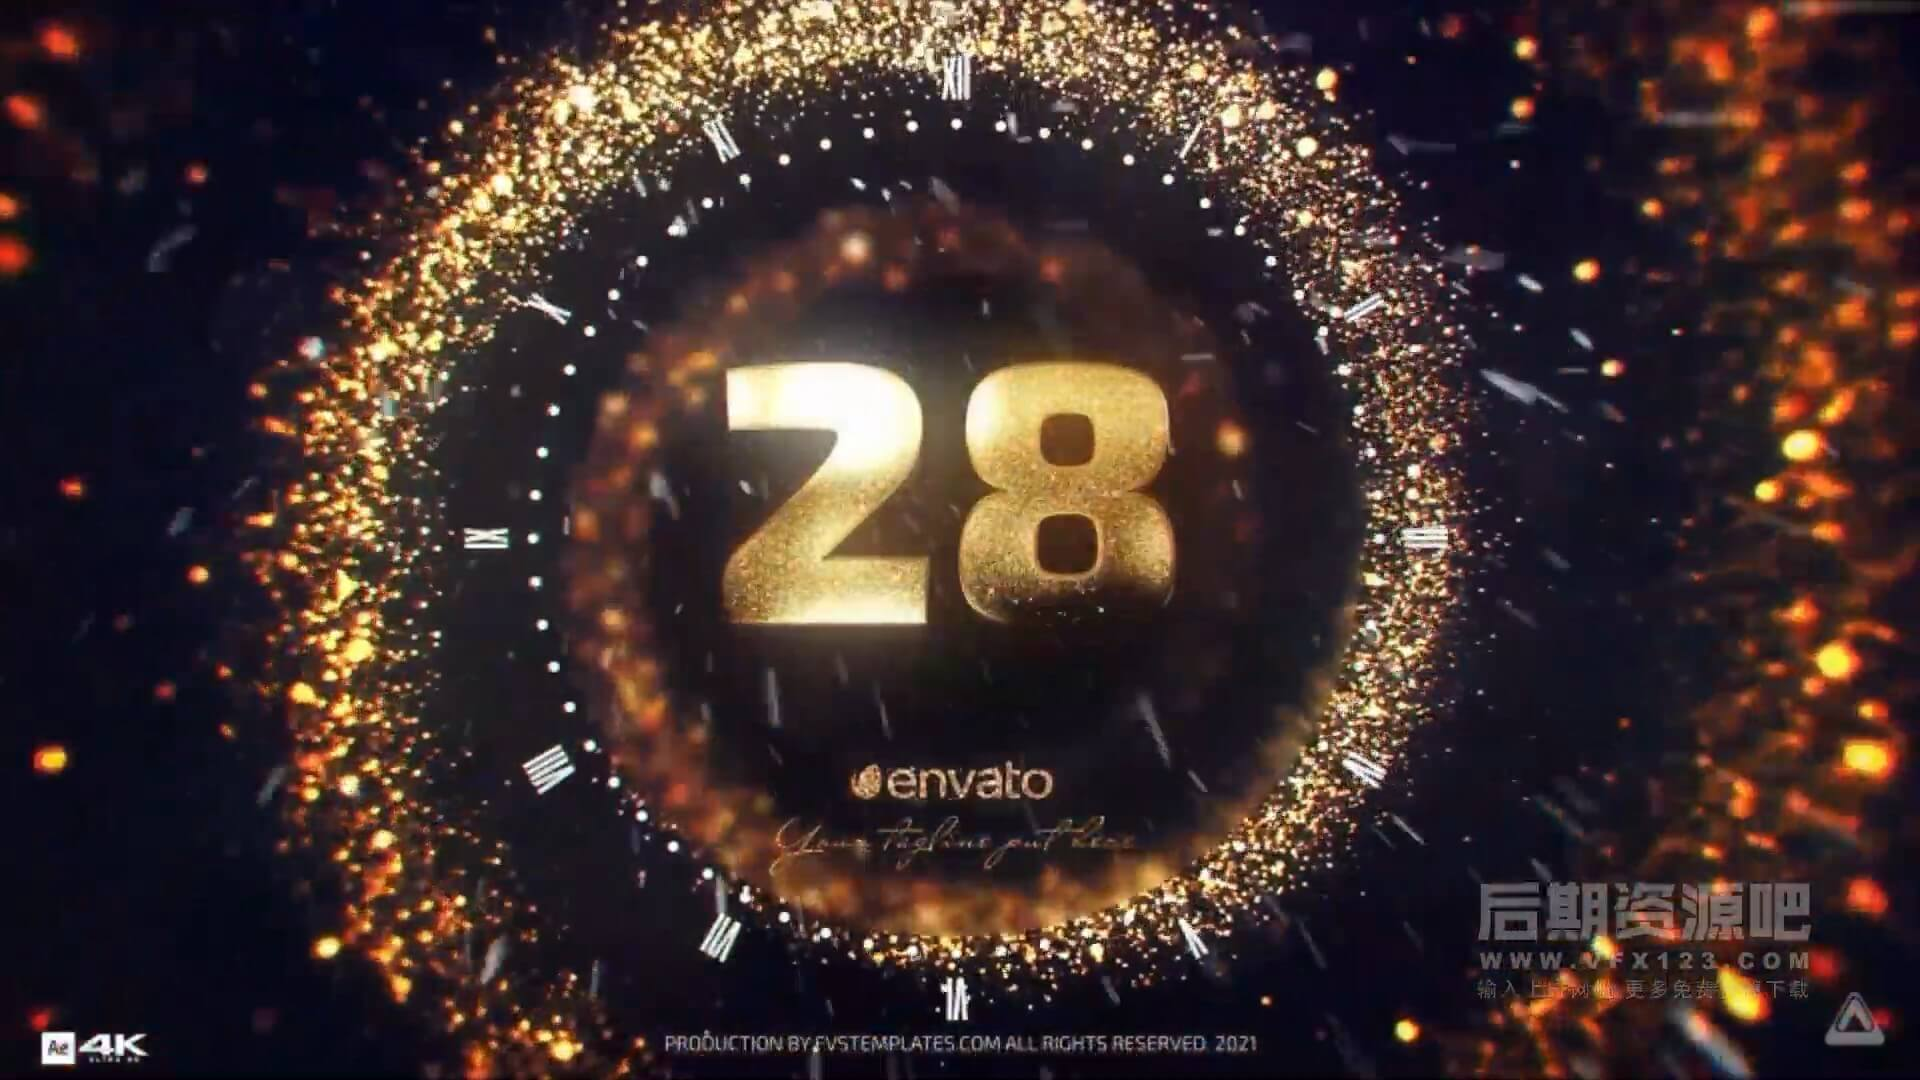 AE模板 2021年金色粒子新年倒计时 新年快乐 Golden New Year Countdown 2021